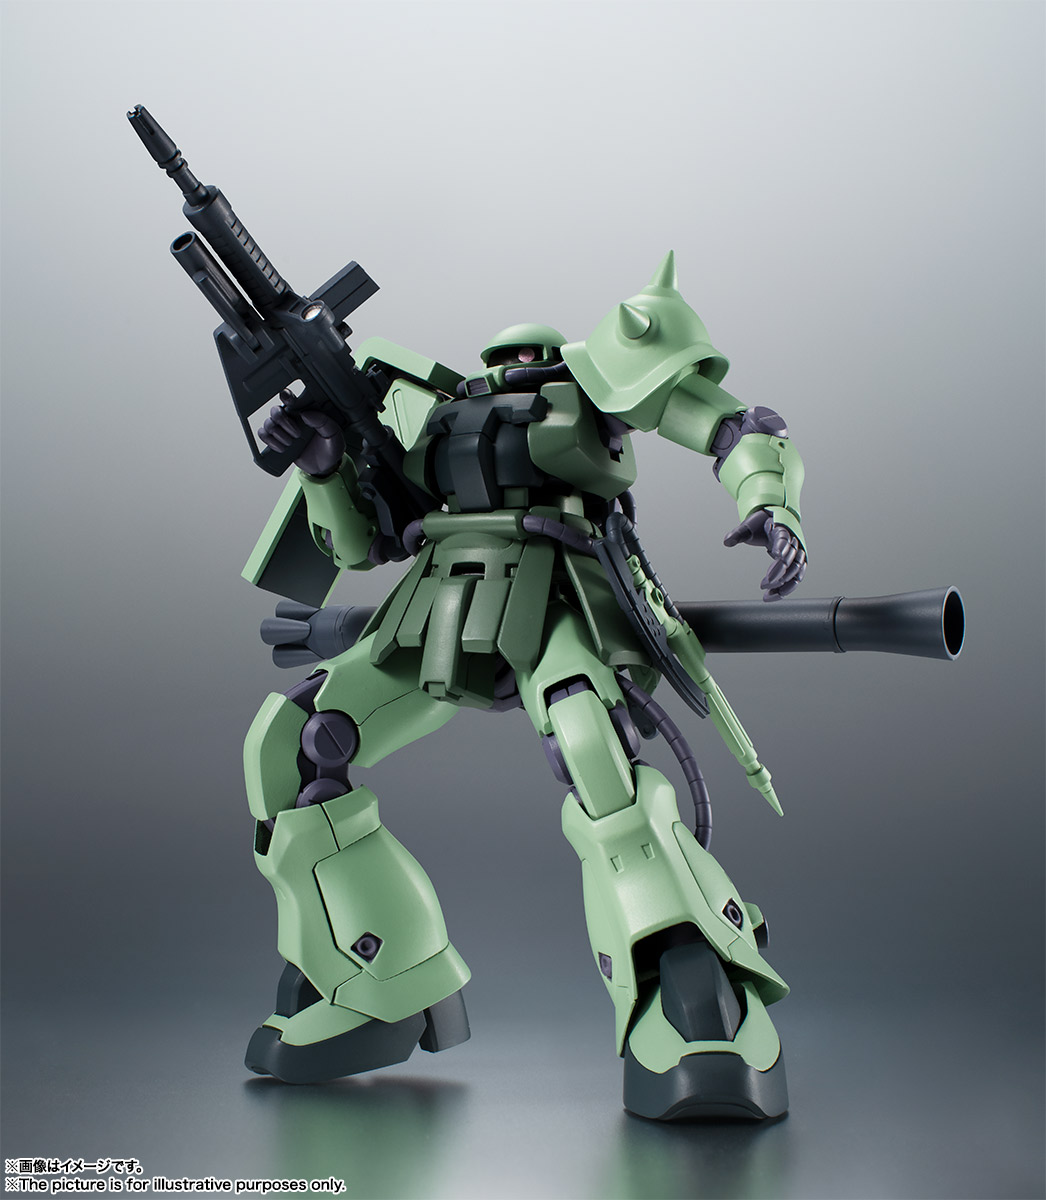 ROBOT魂〈SIDE MS〉『MS-06F-2 ザクII F2型 ver. A.N.I.M.E.』機動戦士ガンダム0083 可動フィギュア-013